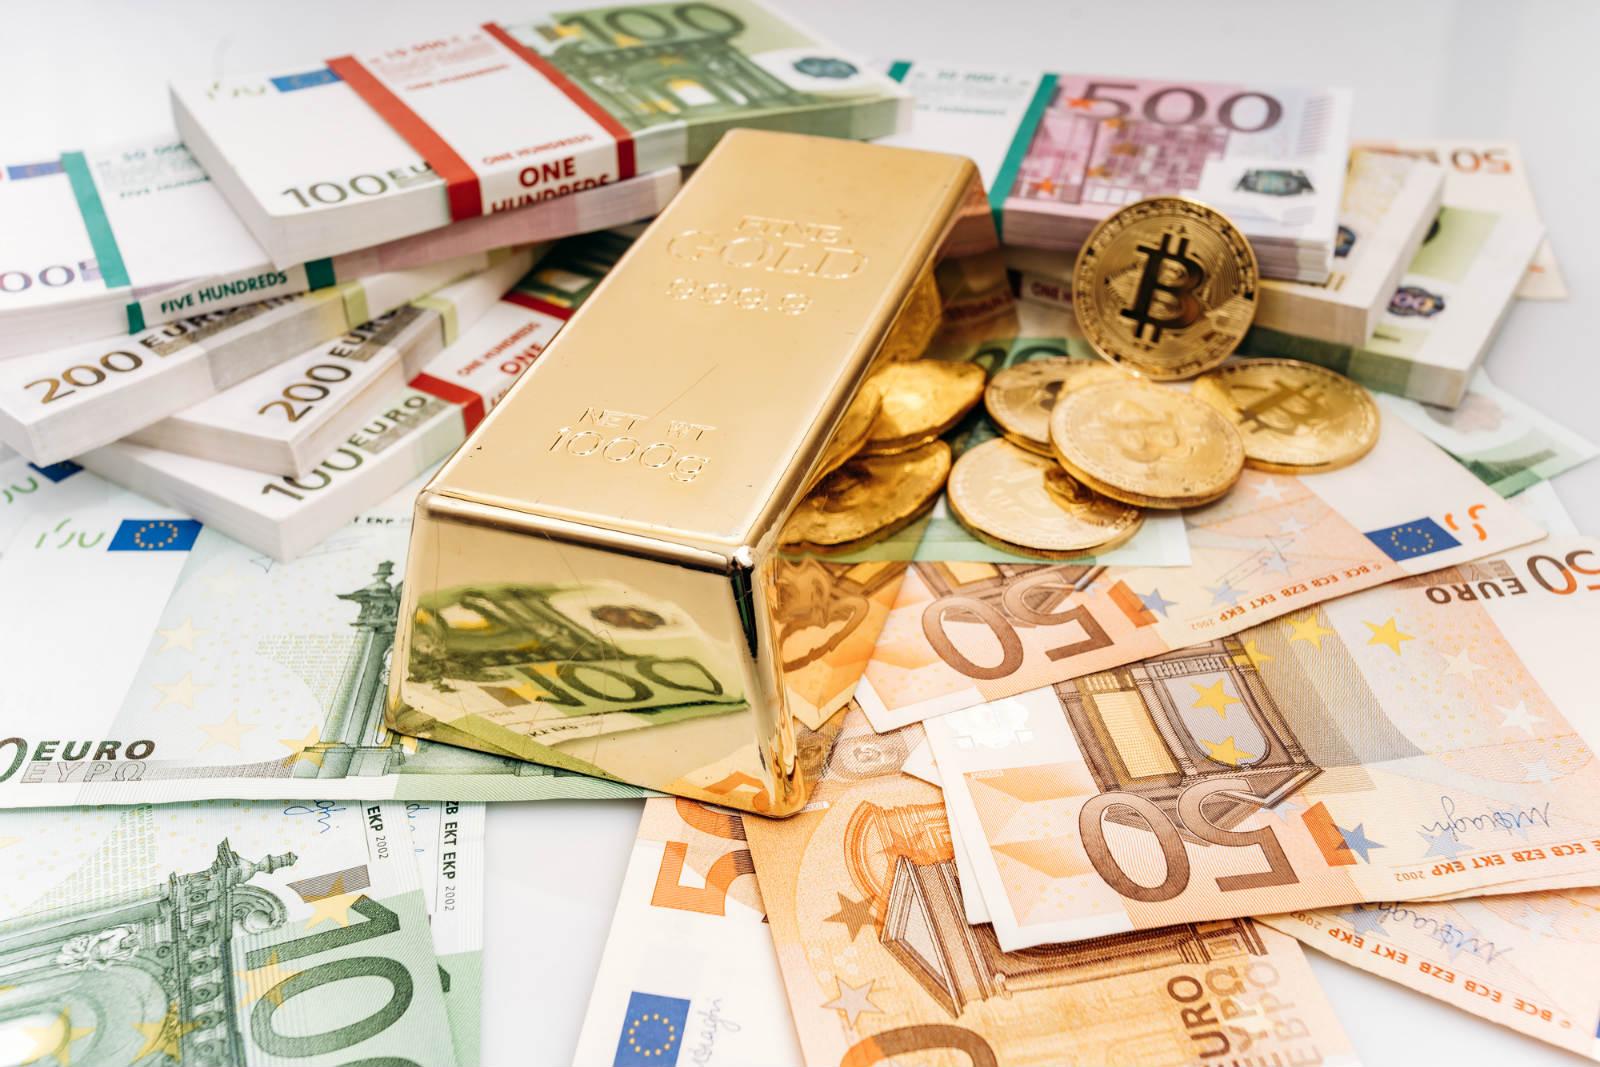 Cara Beli Jual Bitcoin di Indodax? Mampir Sini Dulu!